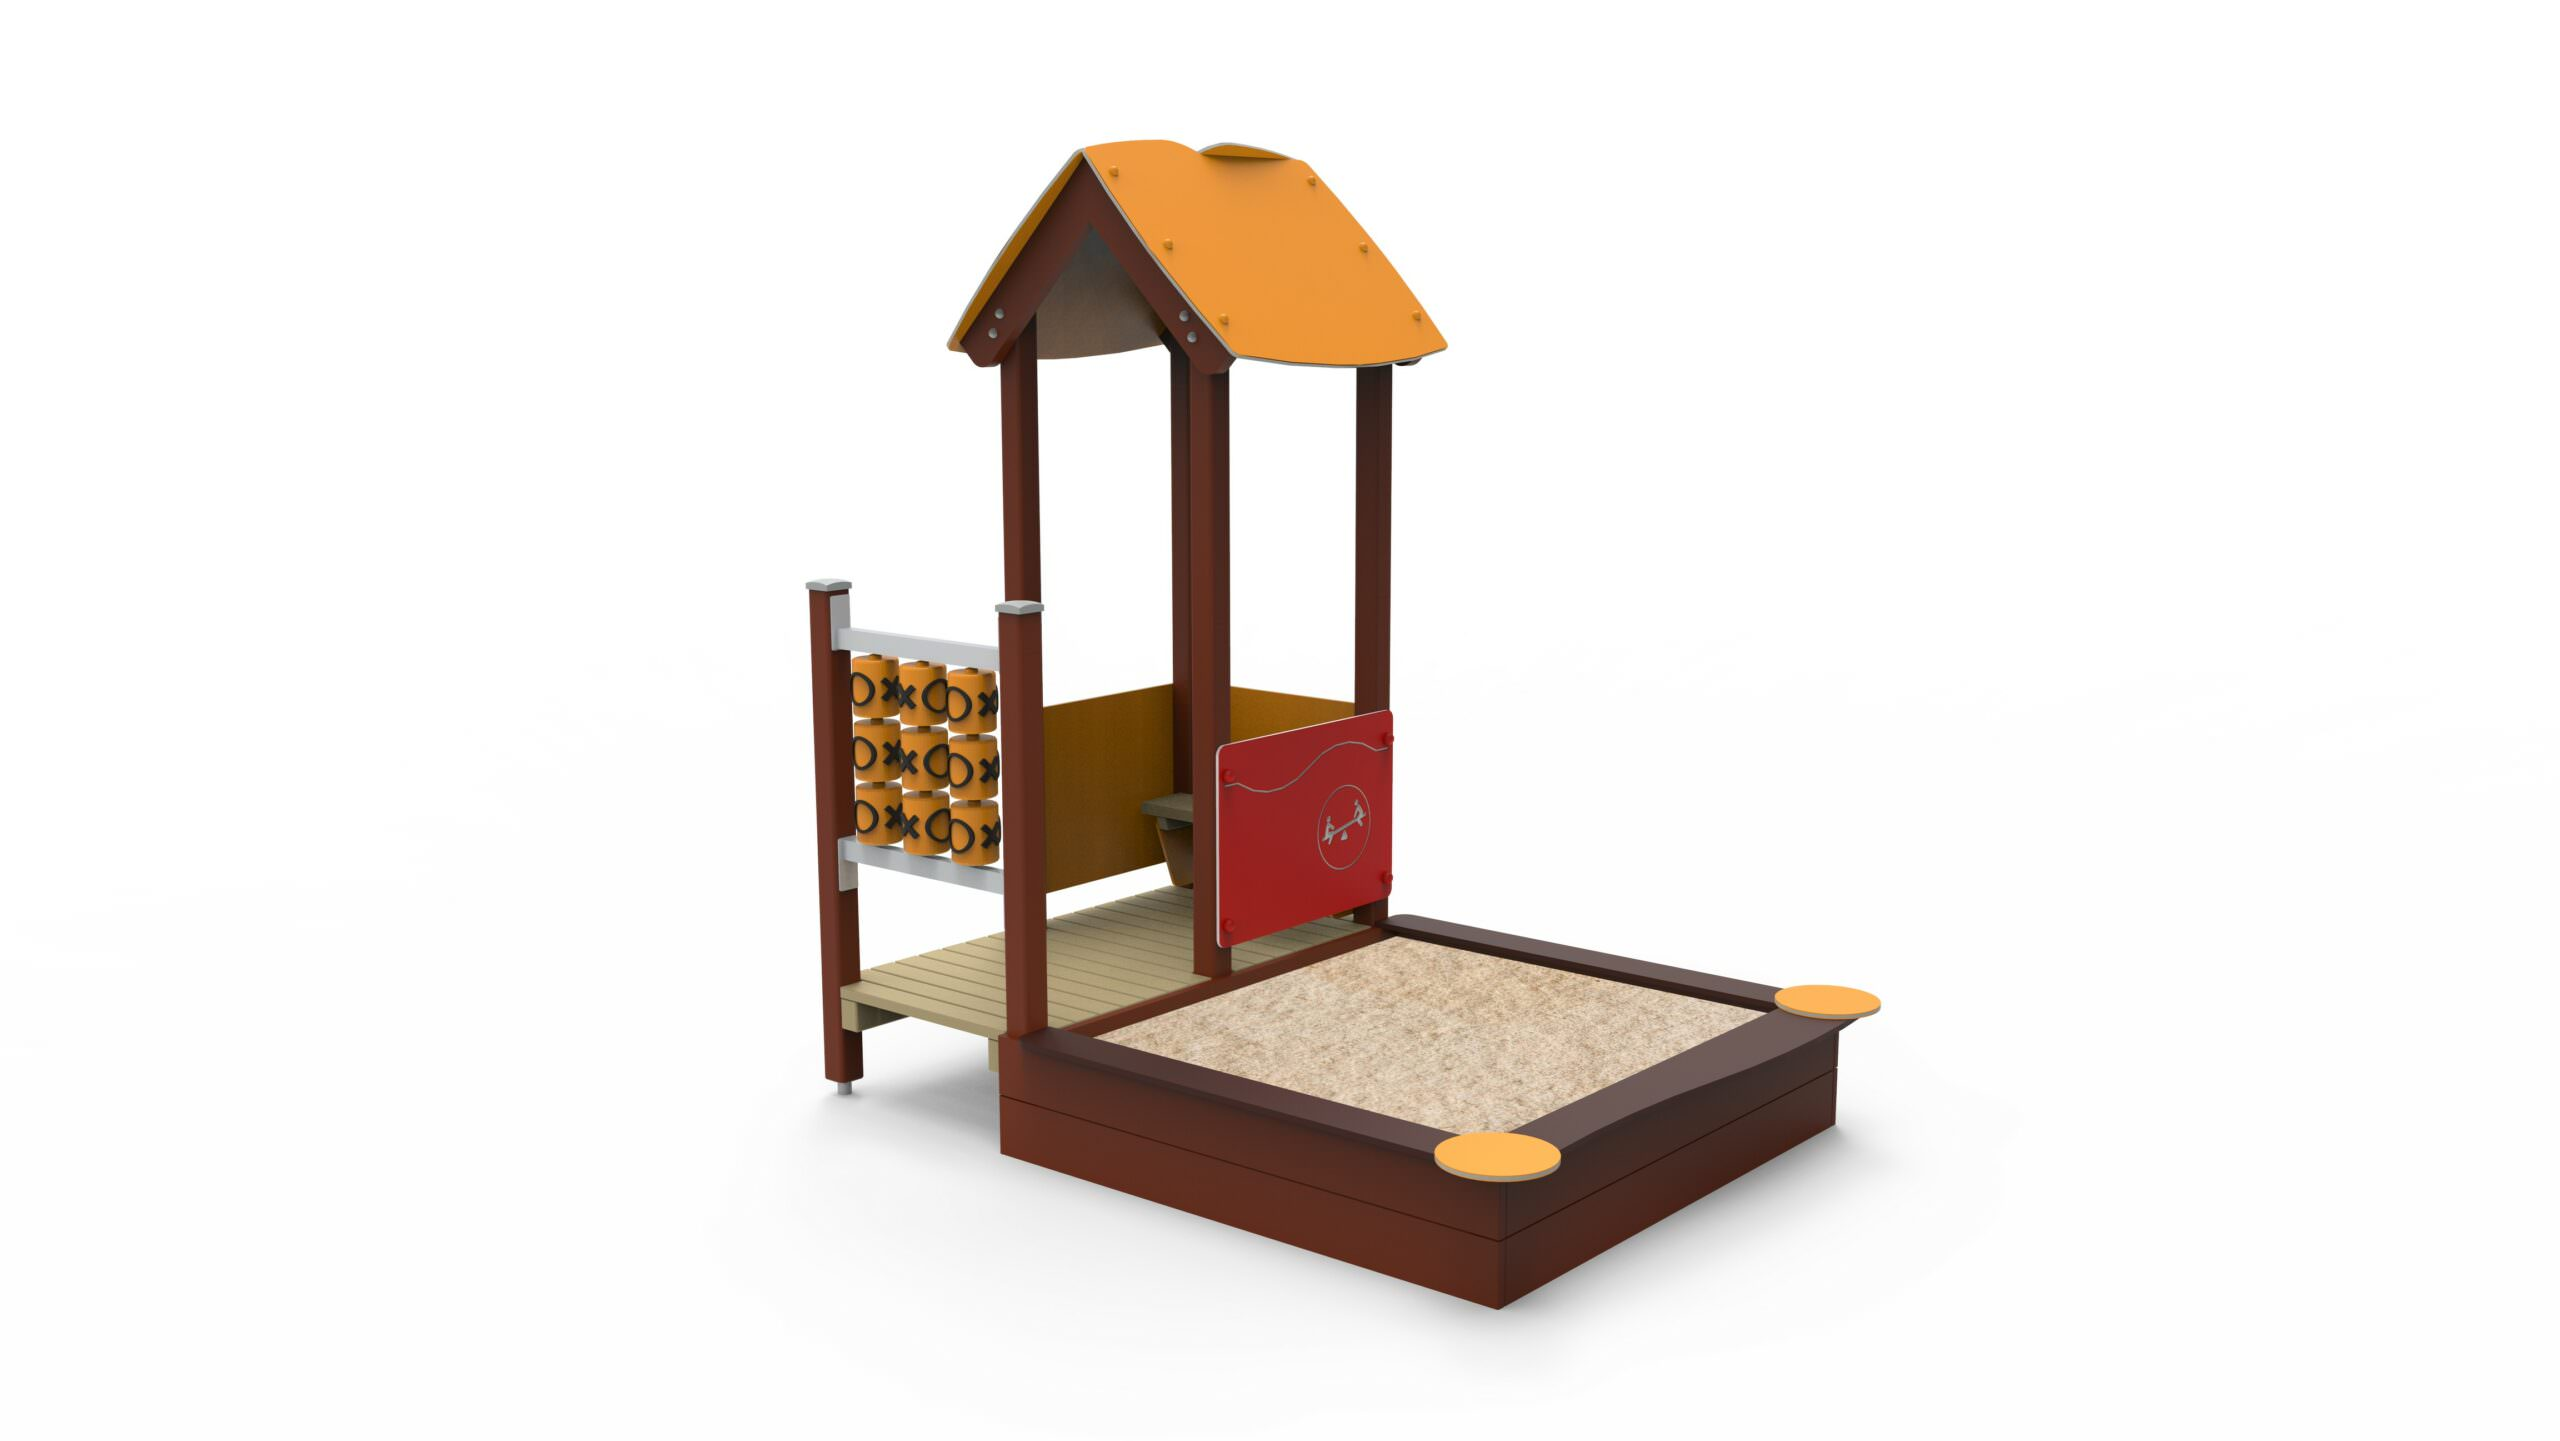 House With Sandbox Plywood